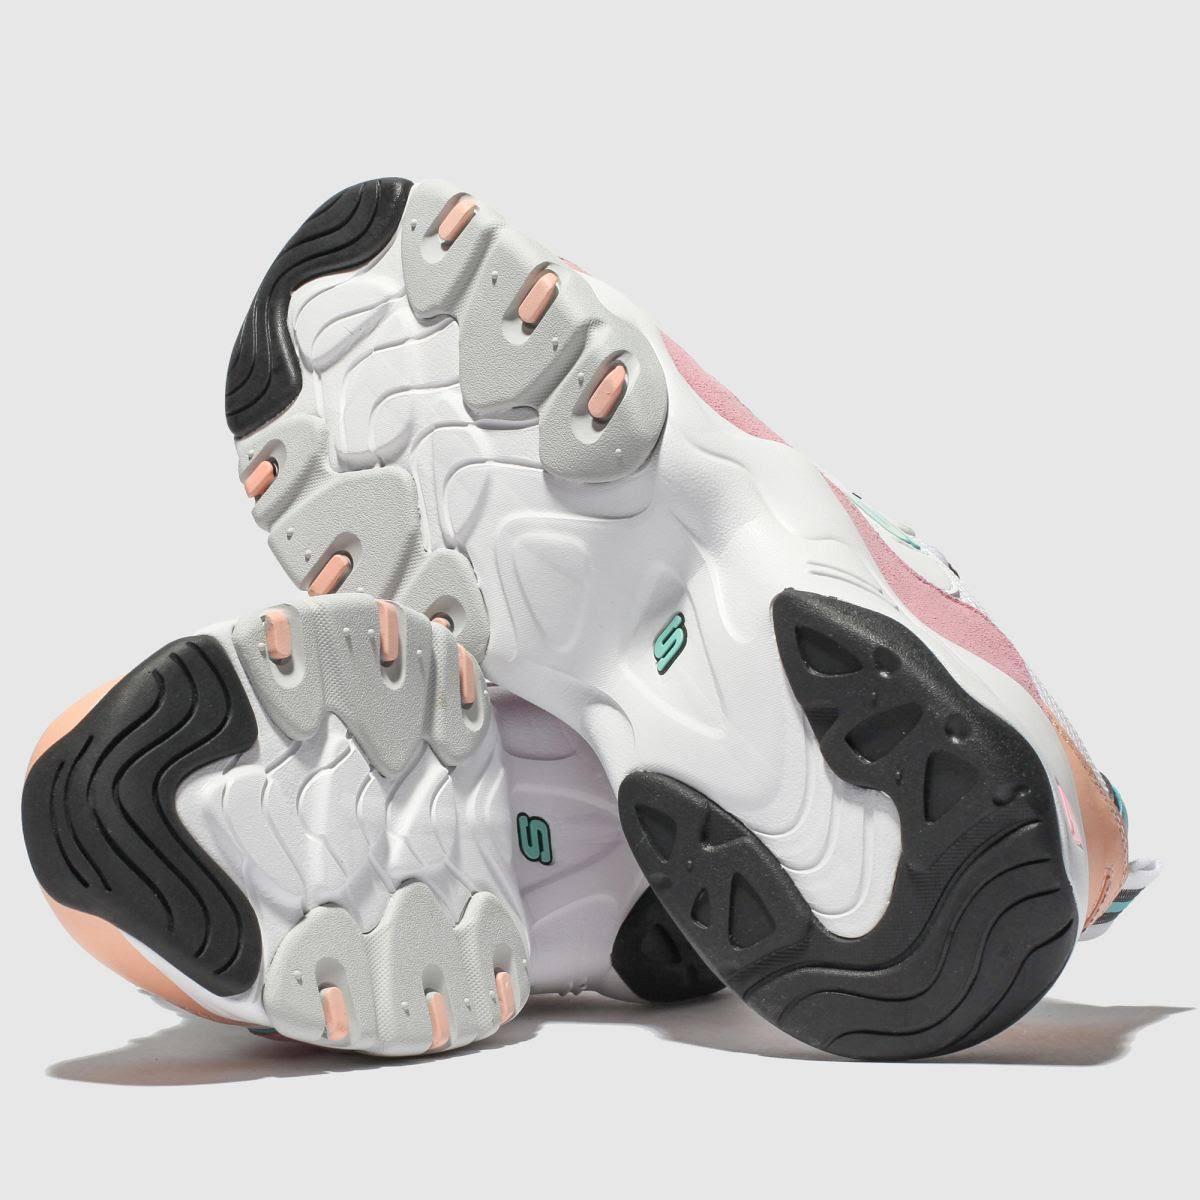 D'lites 3 Sneaker Skechers White Witrozeblauw 0 OkuPTXZi